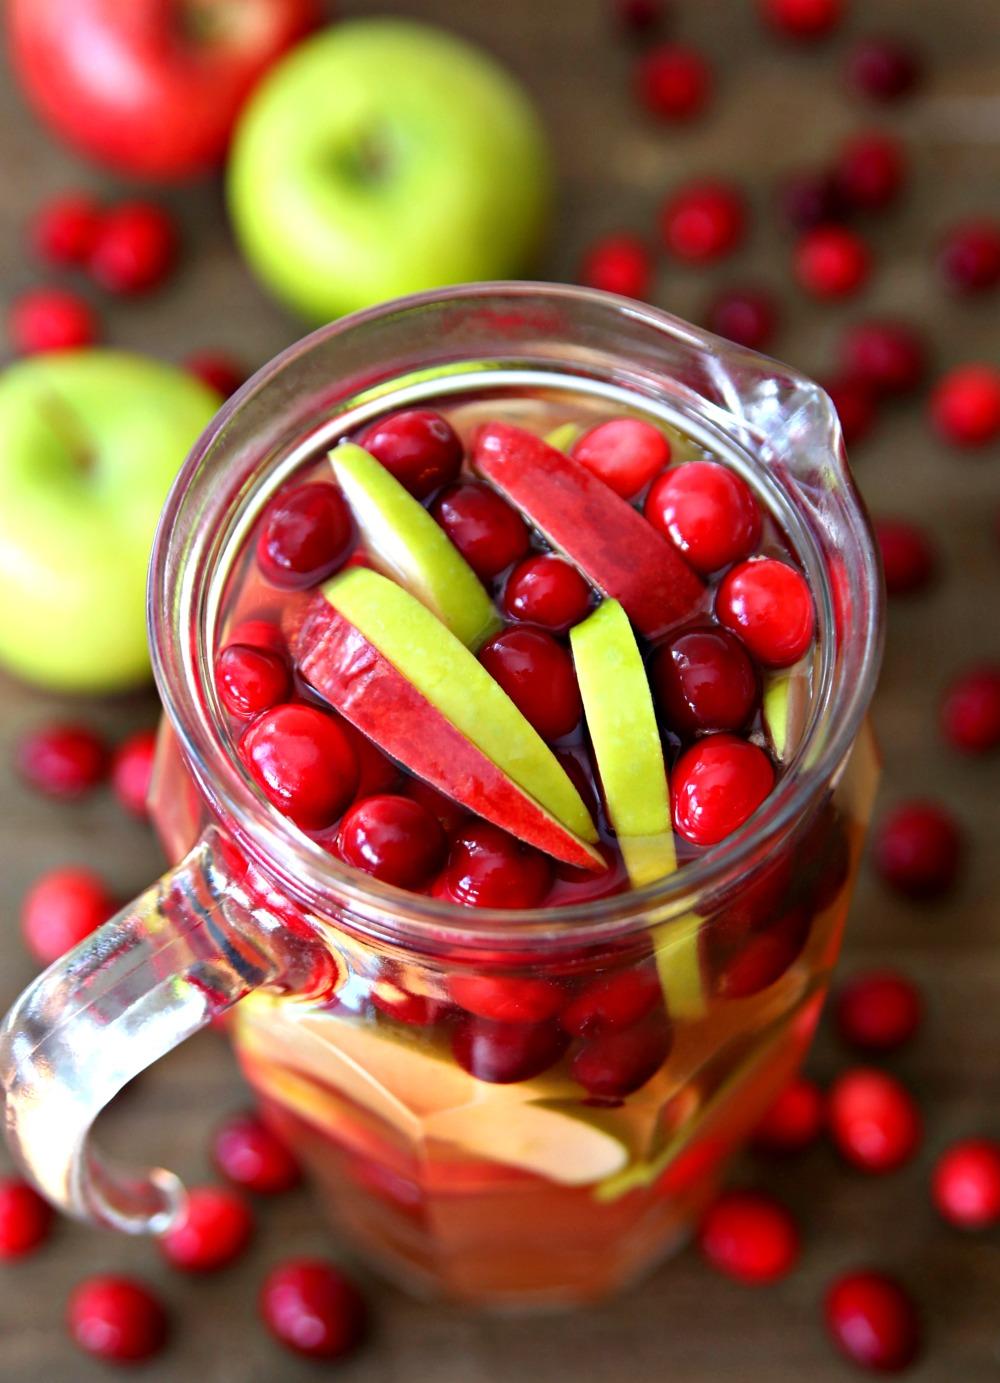 Cranberry Apple Rosé Sangria - The best autumn sangria recipe!